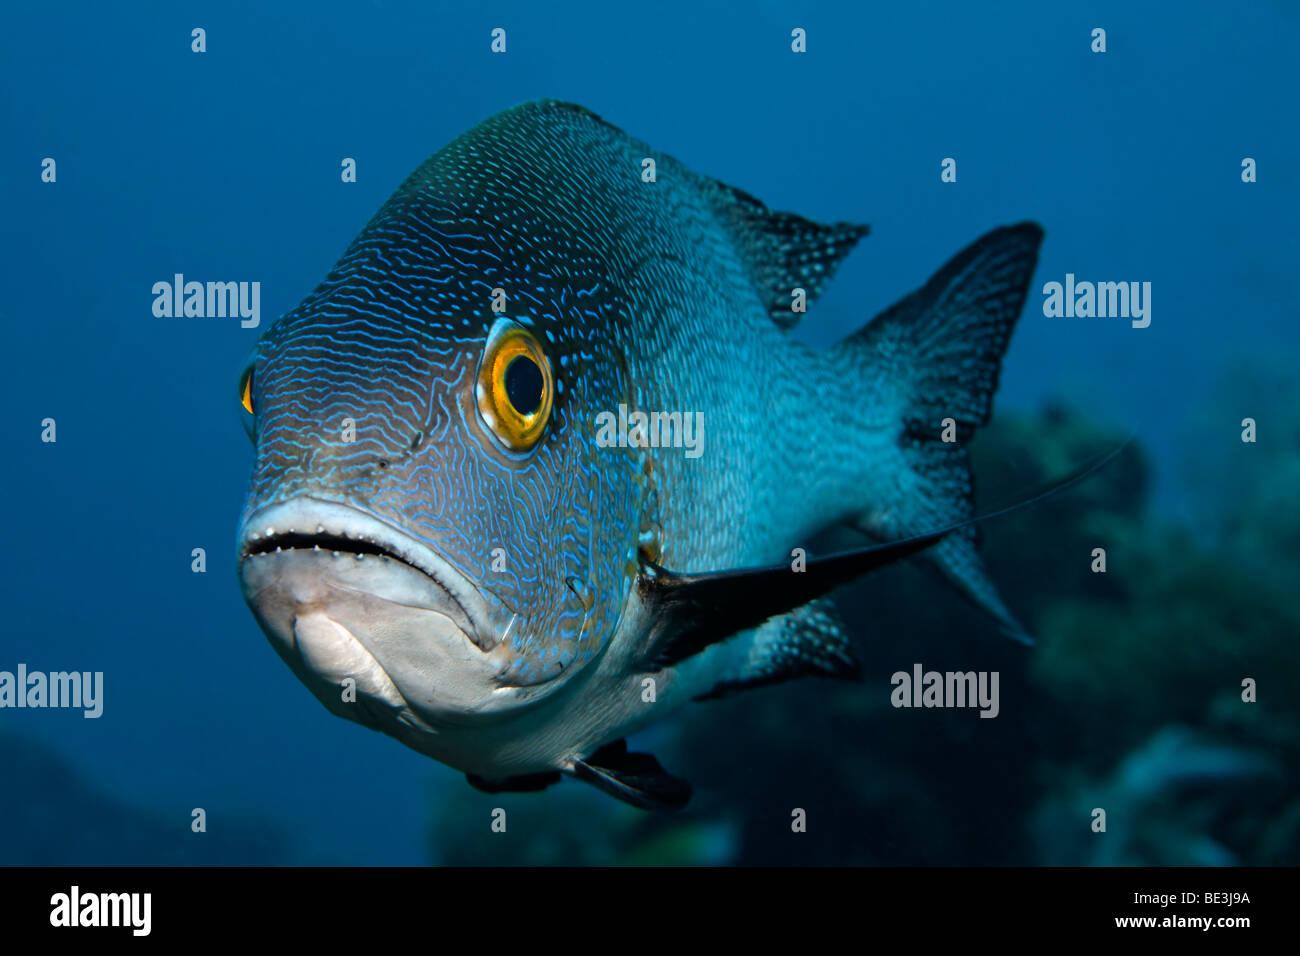 Mitternacht-Schnapper (Macolor Macularis), Kuda, Bali, Indonesien, Pazifischer Ozean Stockbild